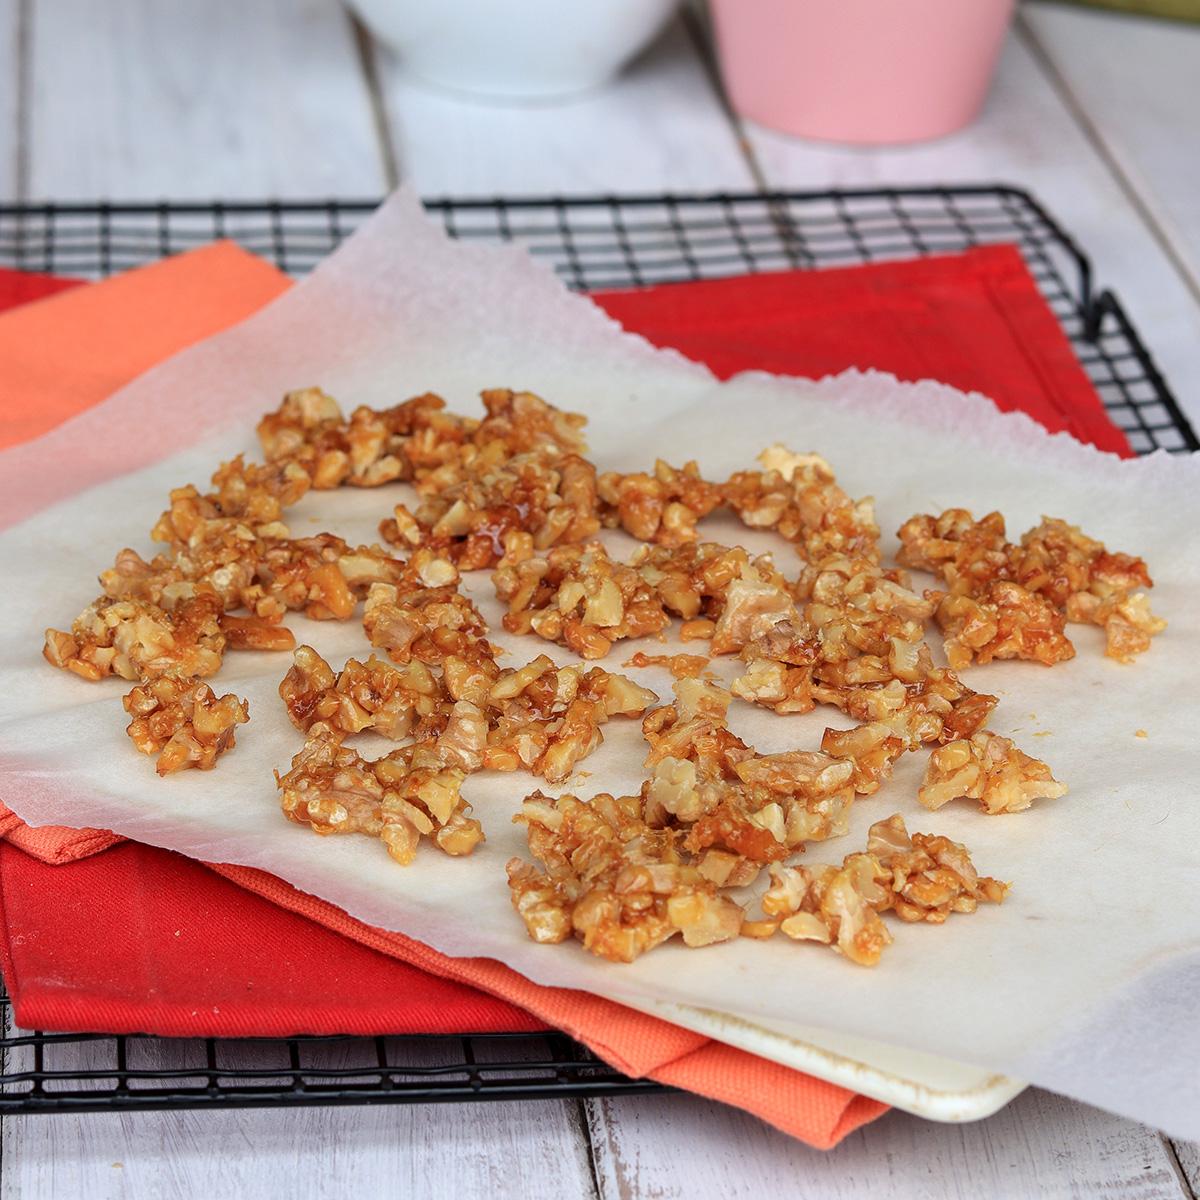 NOCI CARAMELLATE ricetta noci caramellate  come fare noci caramellate